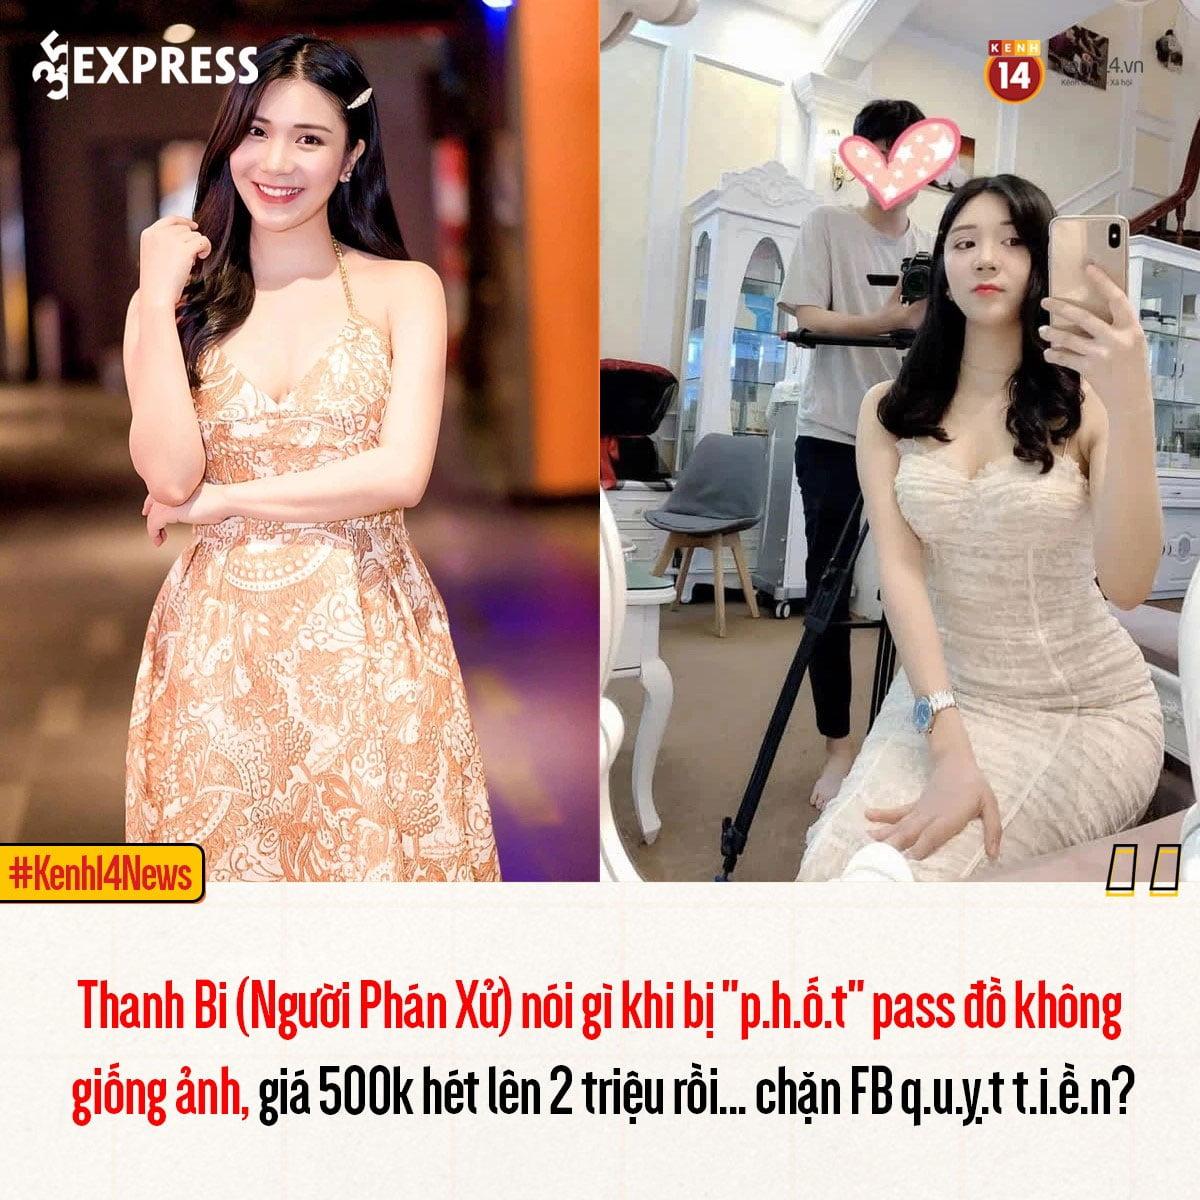 thanh-bi-va-phot-pass-do-nhu-gie-lau-nha-35express